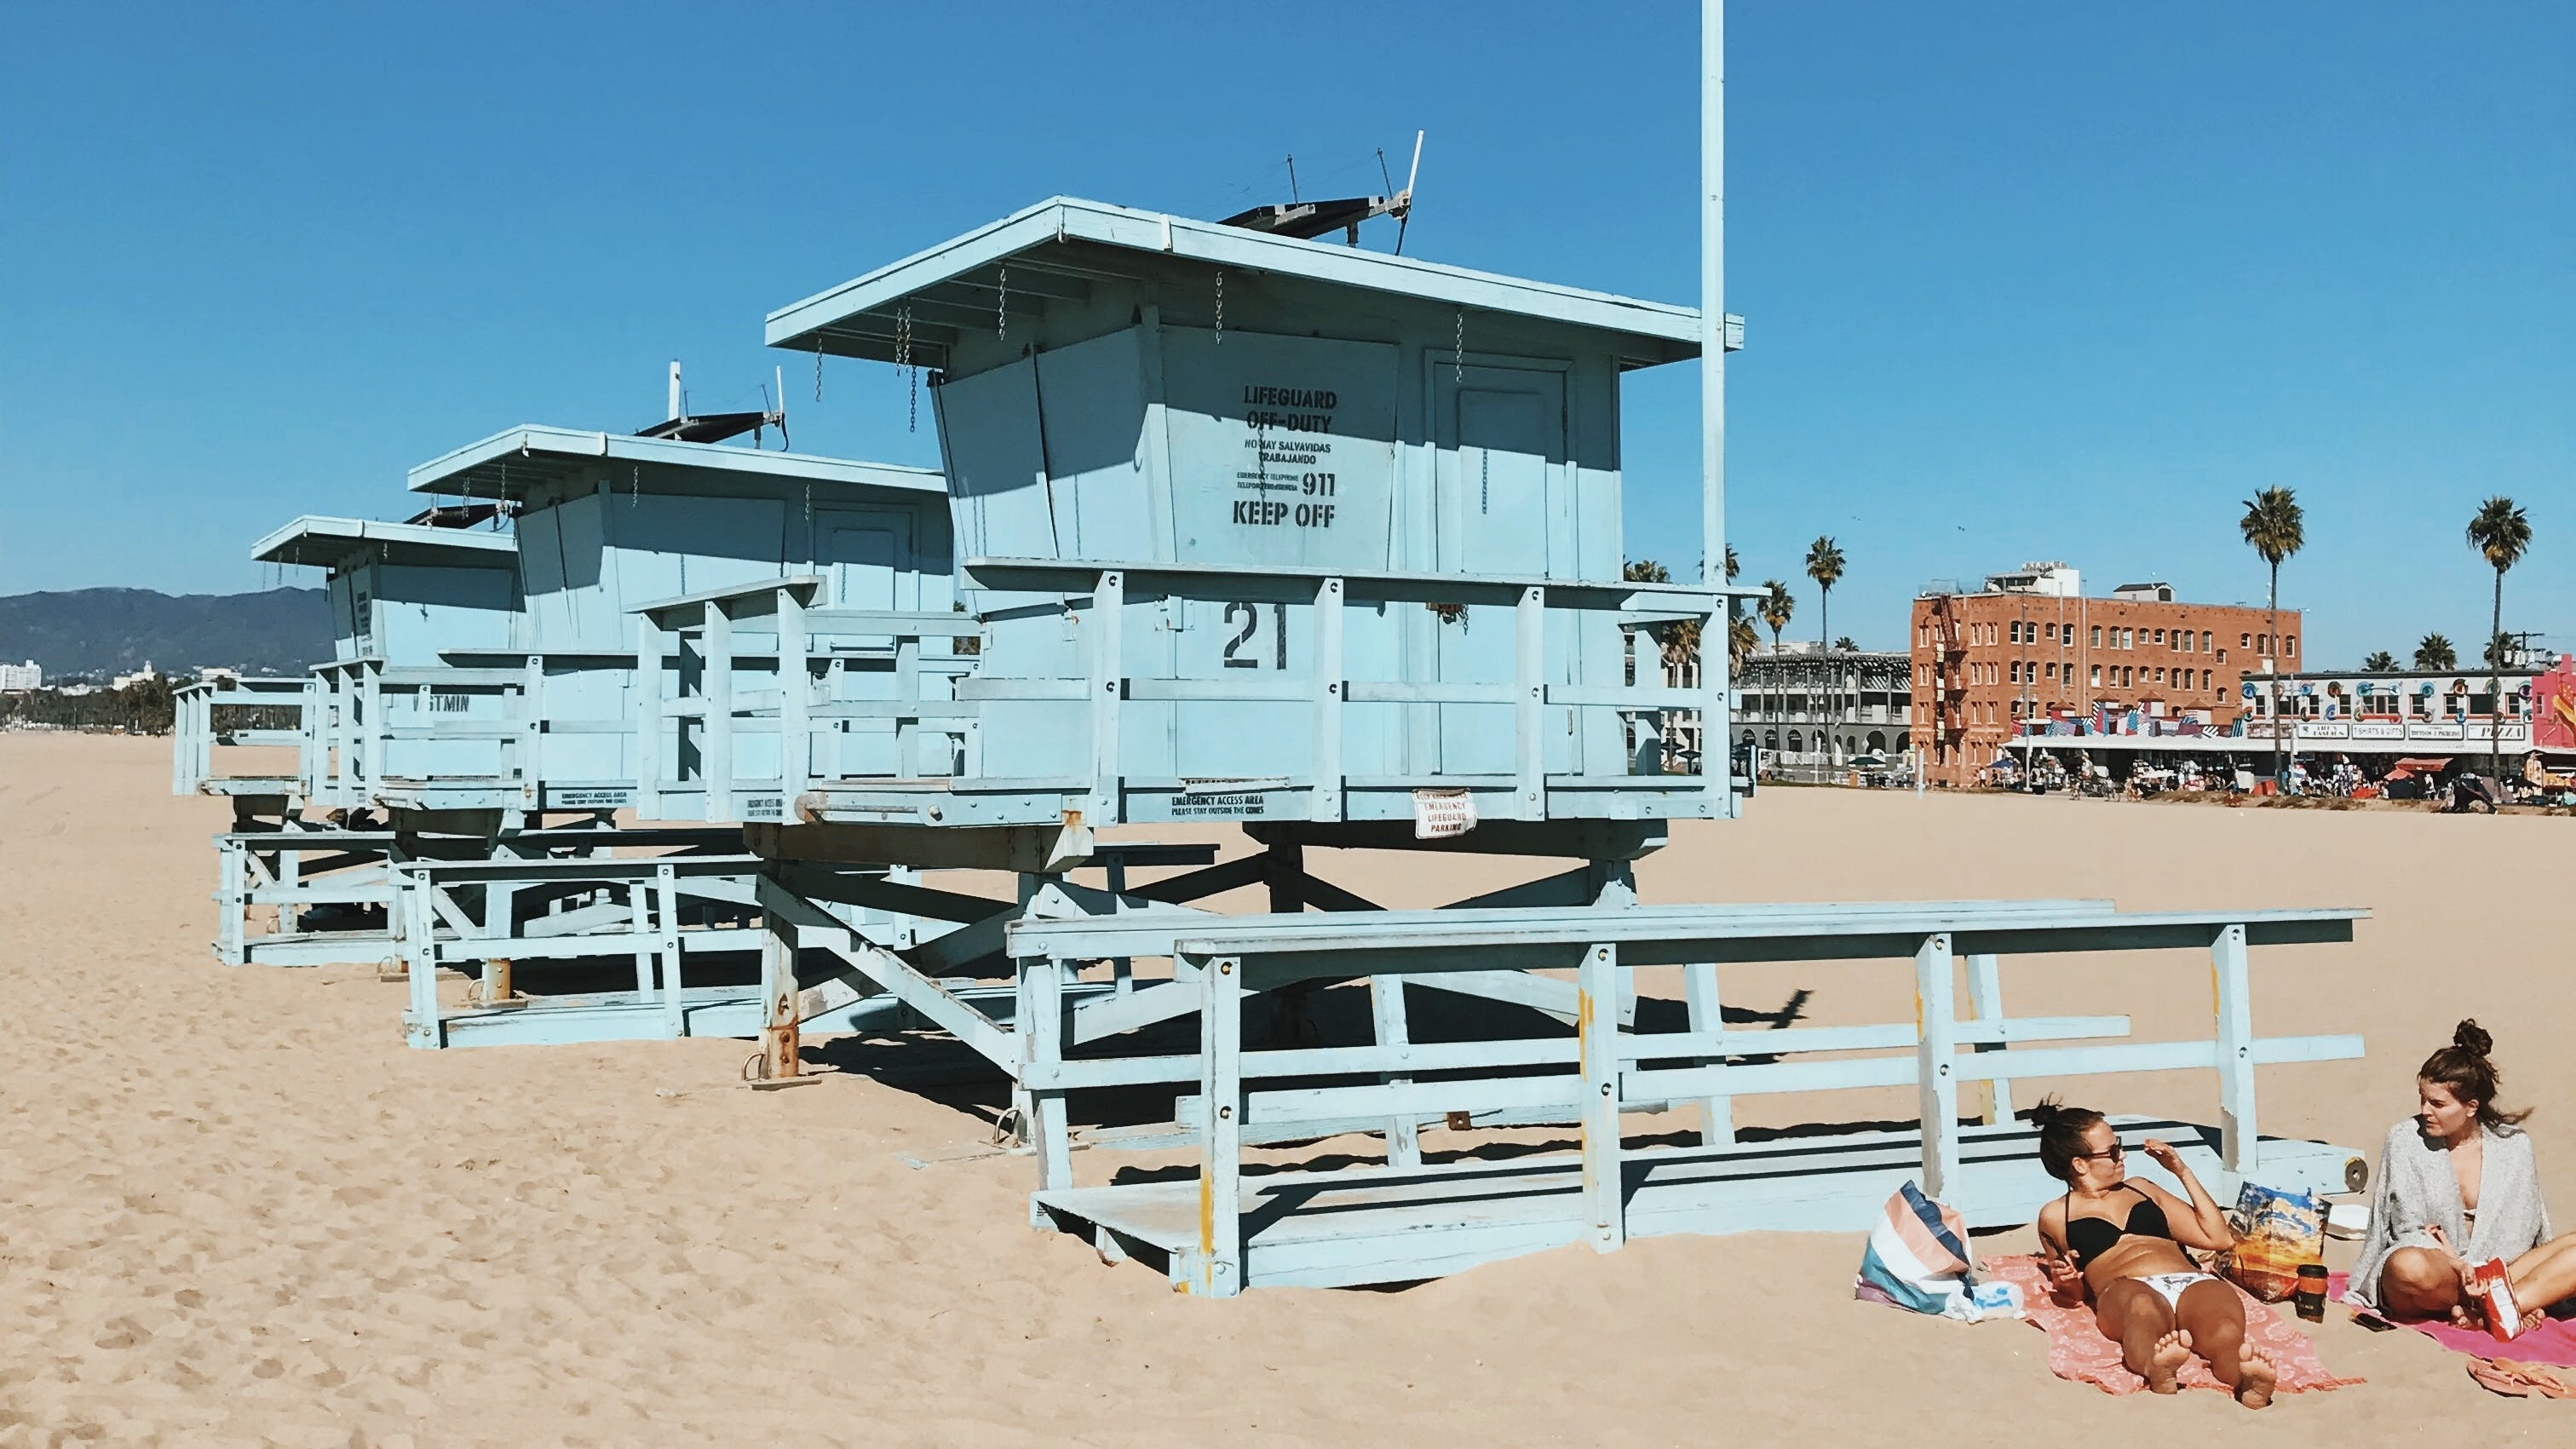 Free stock photo of beaches, cali, california, city